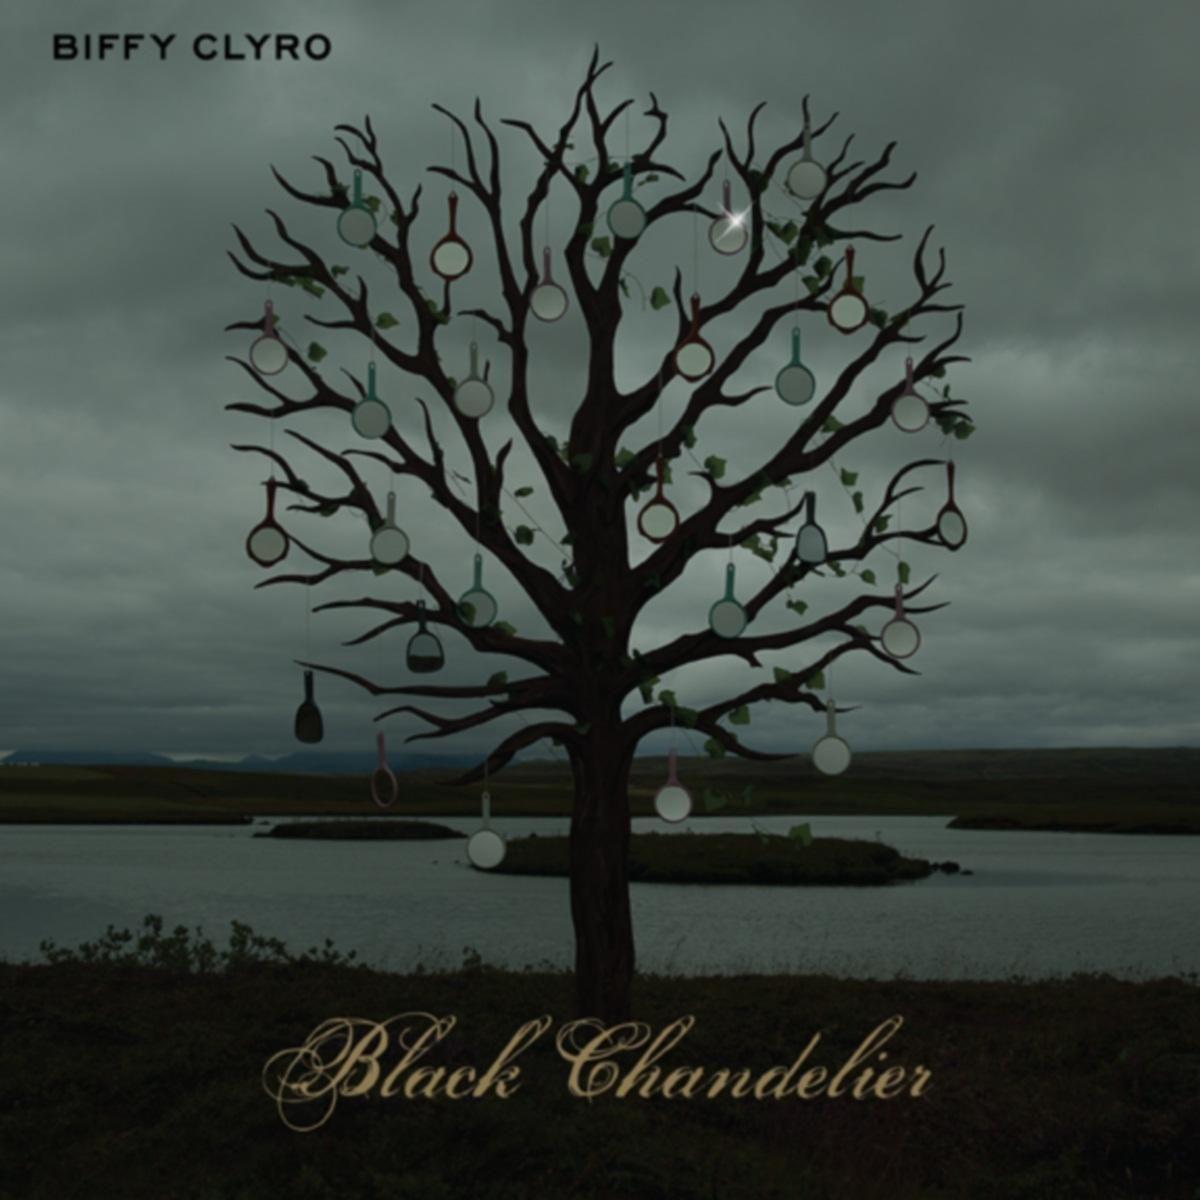 Single cover art biffy clyro black chandelier 012013 music single cover art biffy clyro black chandelier 012013 arubaitofo Image collections